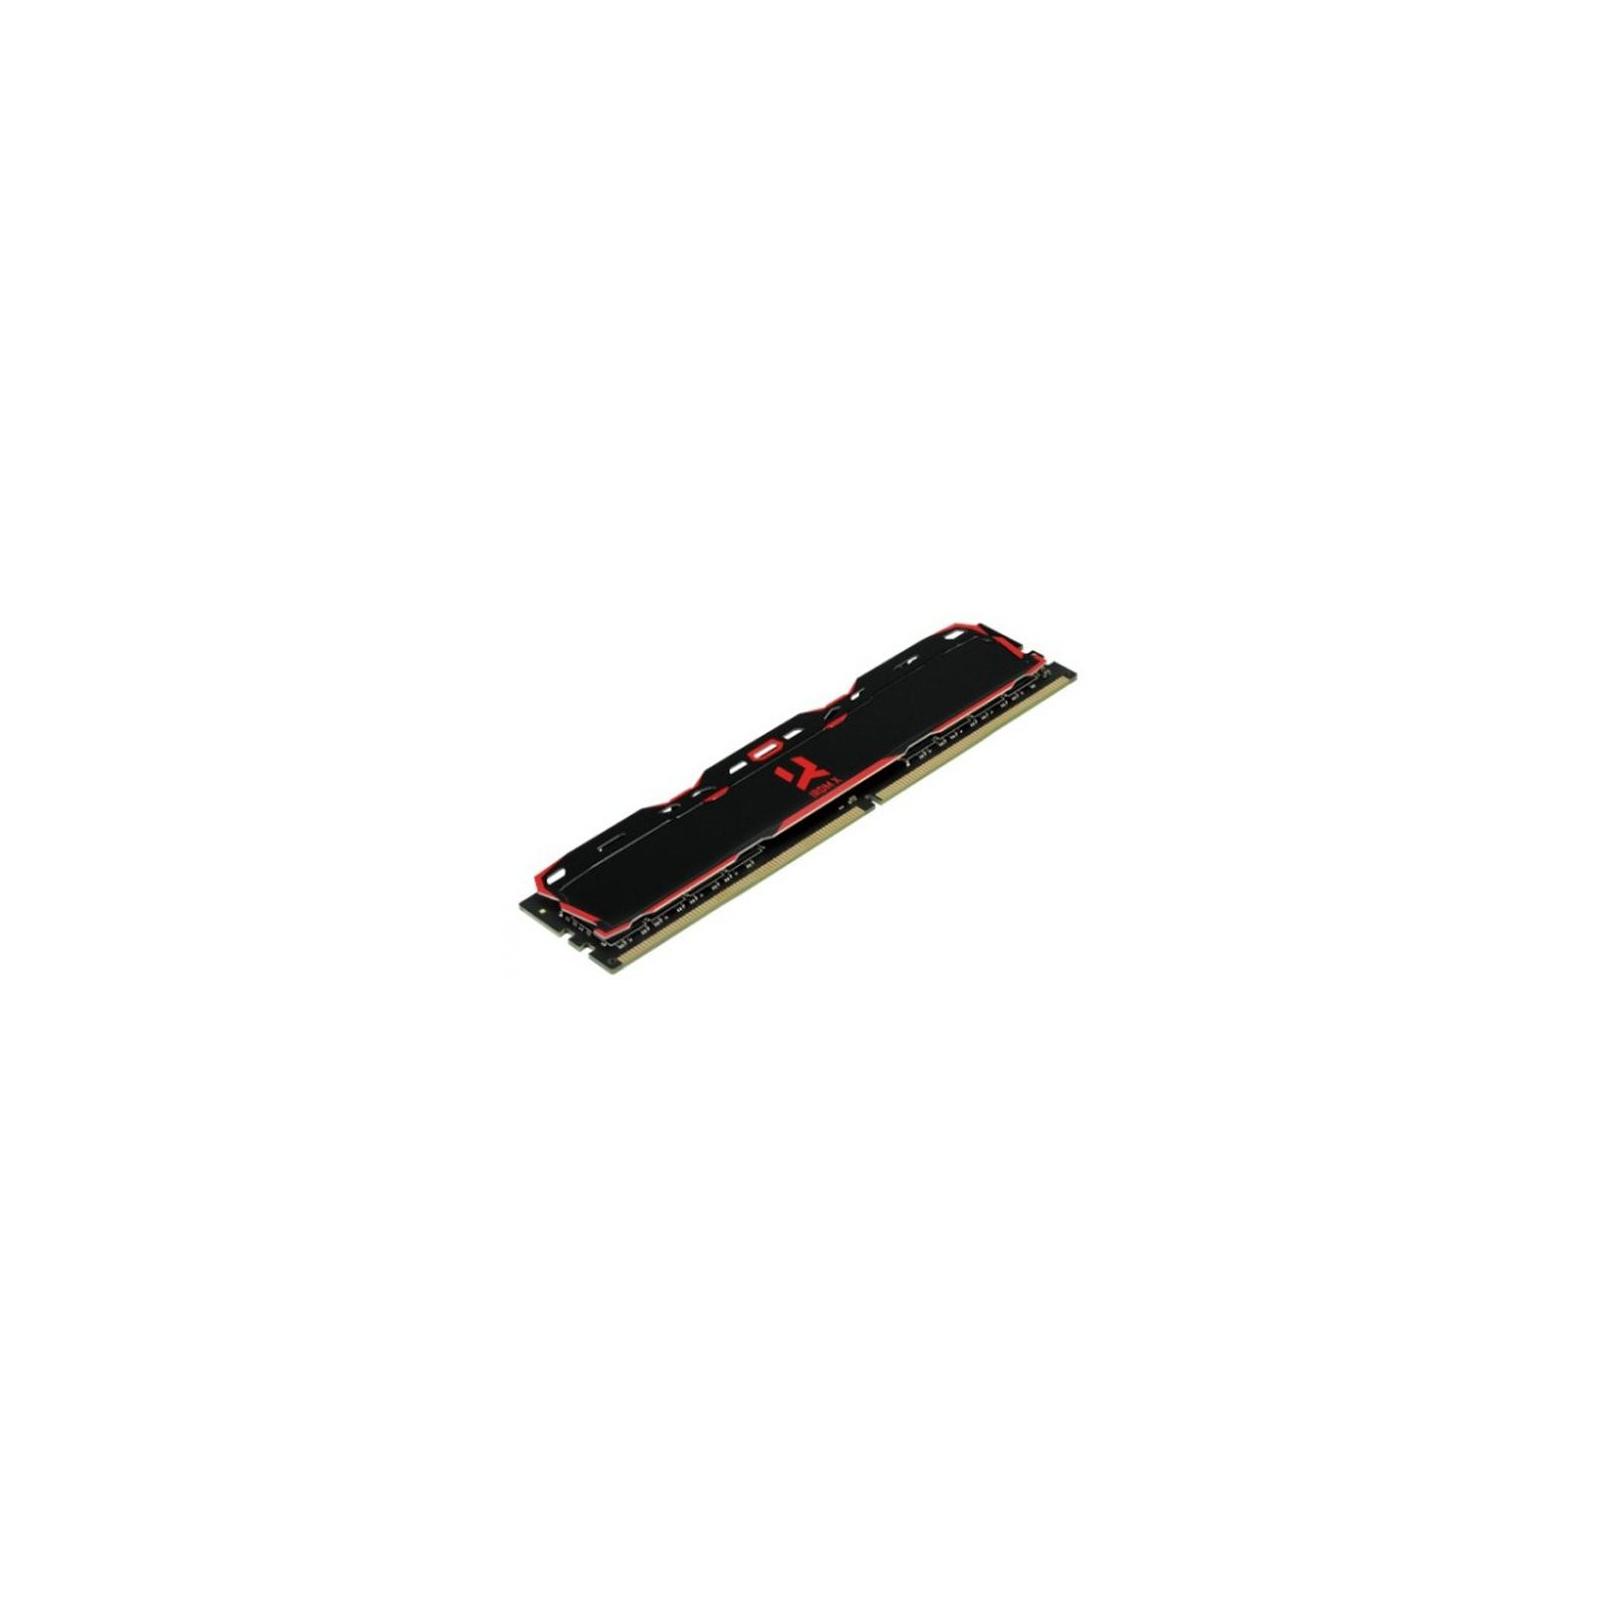 Модуль памяти для компьютера DDR4 8GB 3000 MHz Iridium X Black Goodram (IR-X3000D464L16S/8G) изображение 2